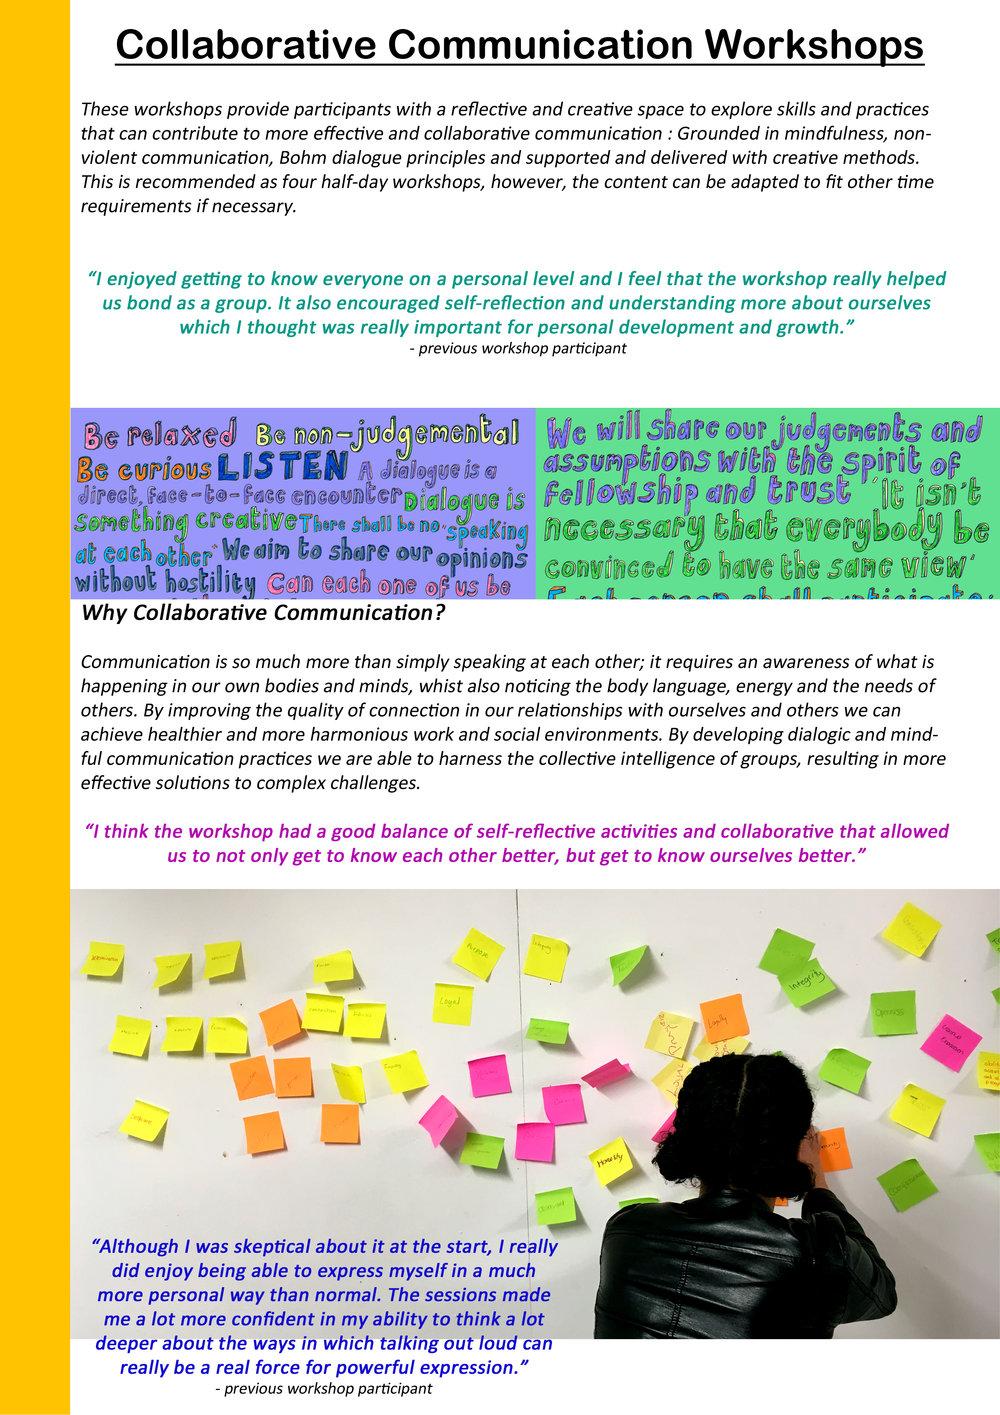 collaborative communication workshops 1.jpg